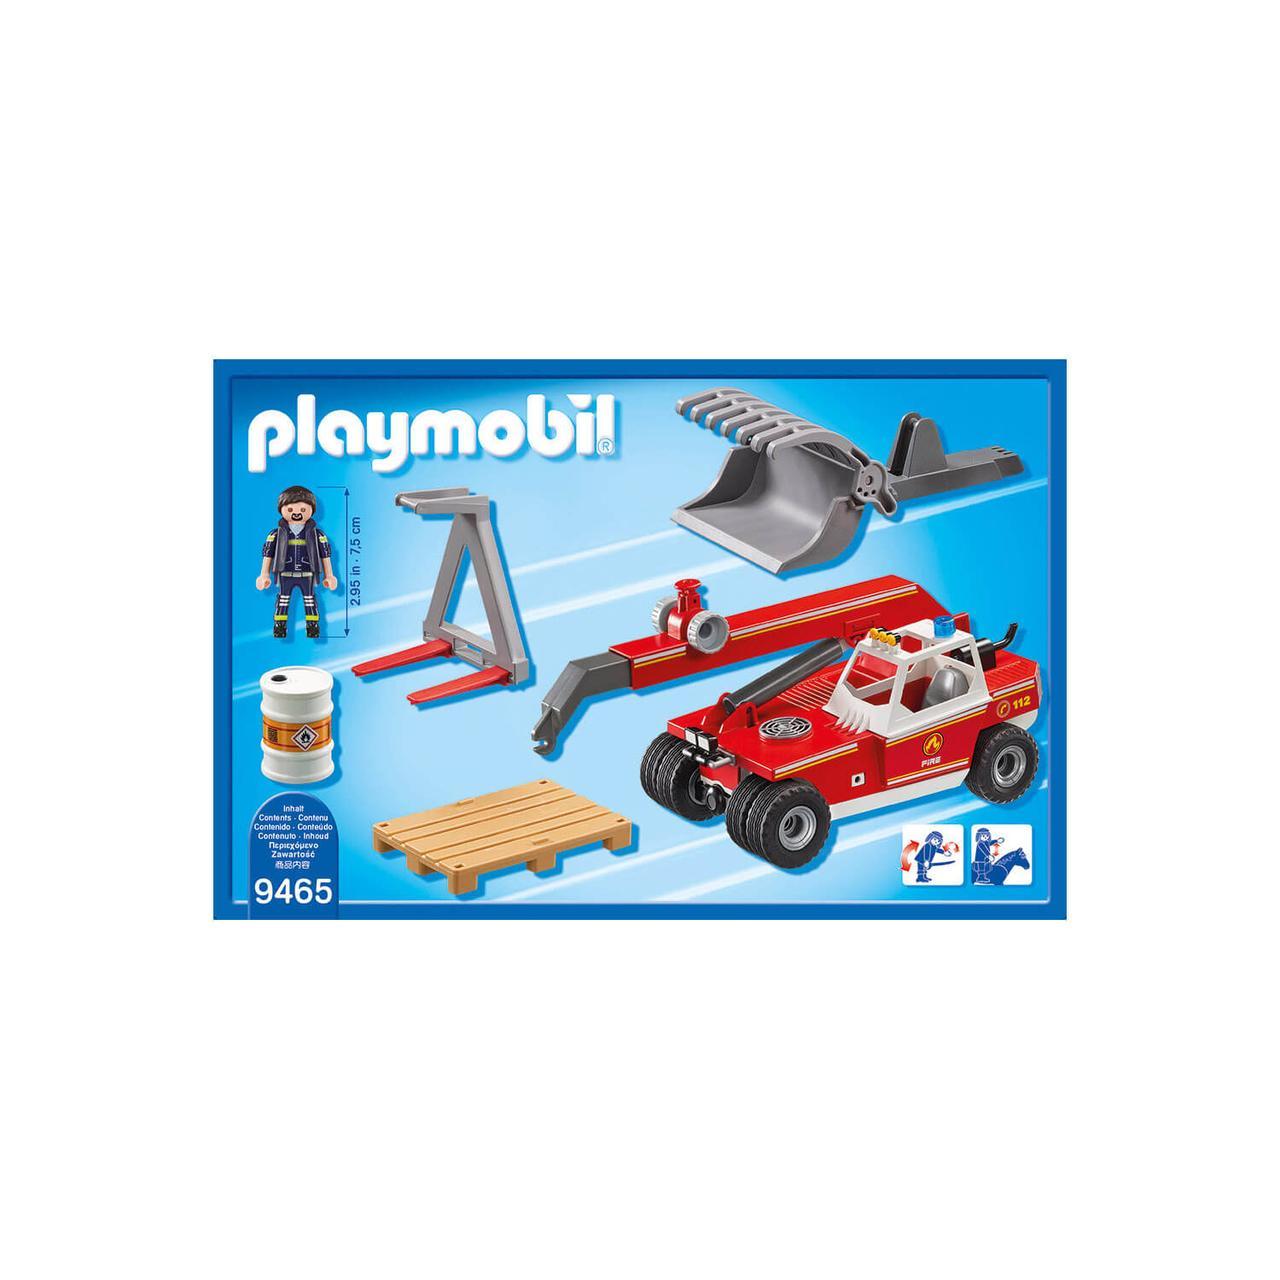 Конструктор Playmobil Пожарная служба: Пожарный Кран 9465pm - фото 2